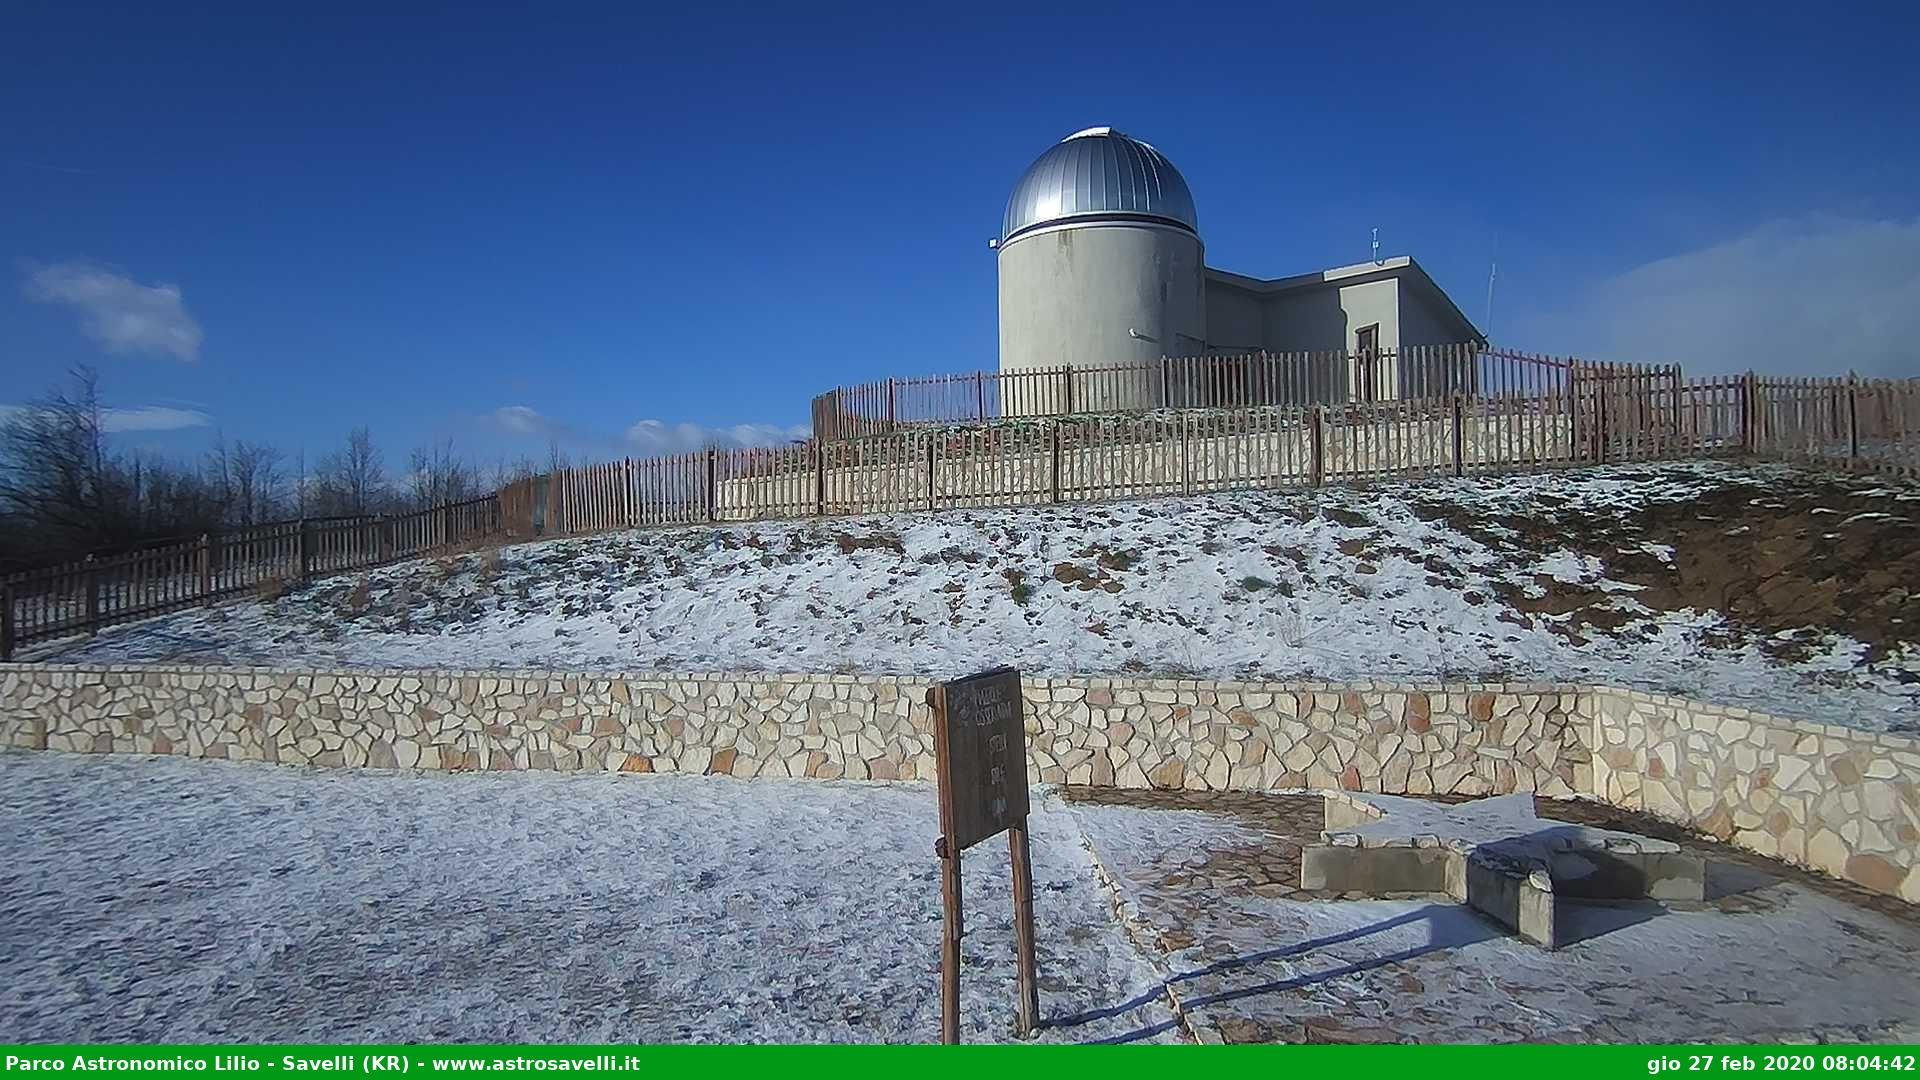 parco astronomico lilio savelli neve 27 febbraio 2020